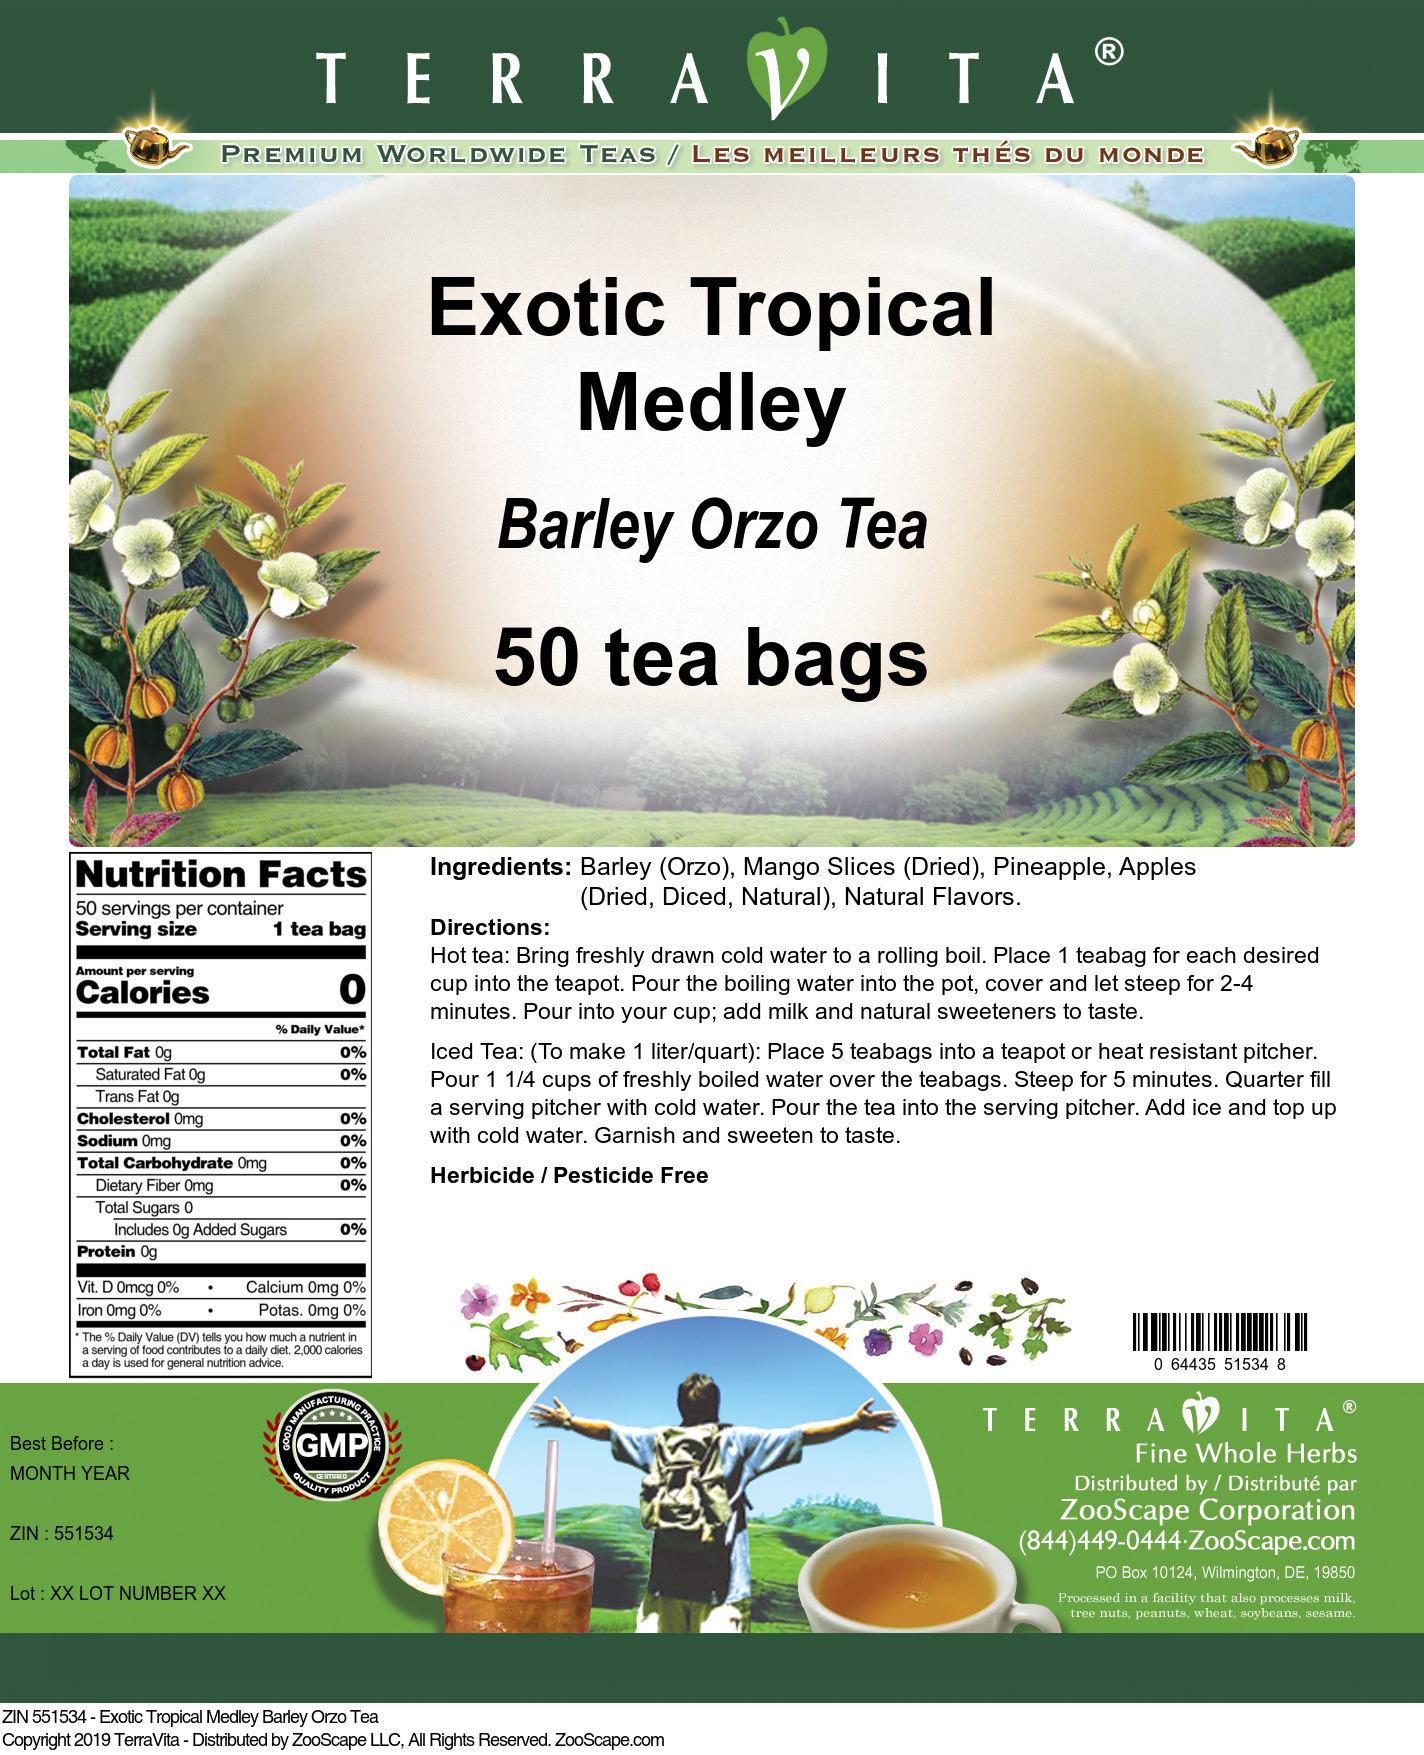 Exotic Tropical Medley Barley Orzo Tea